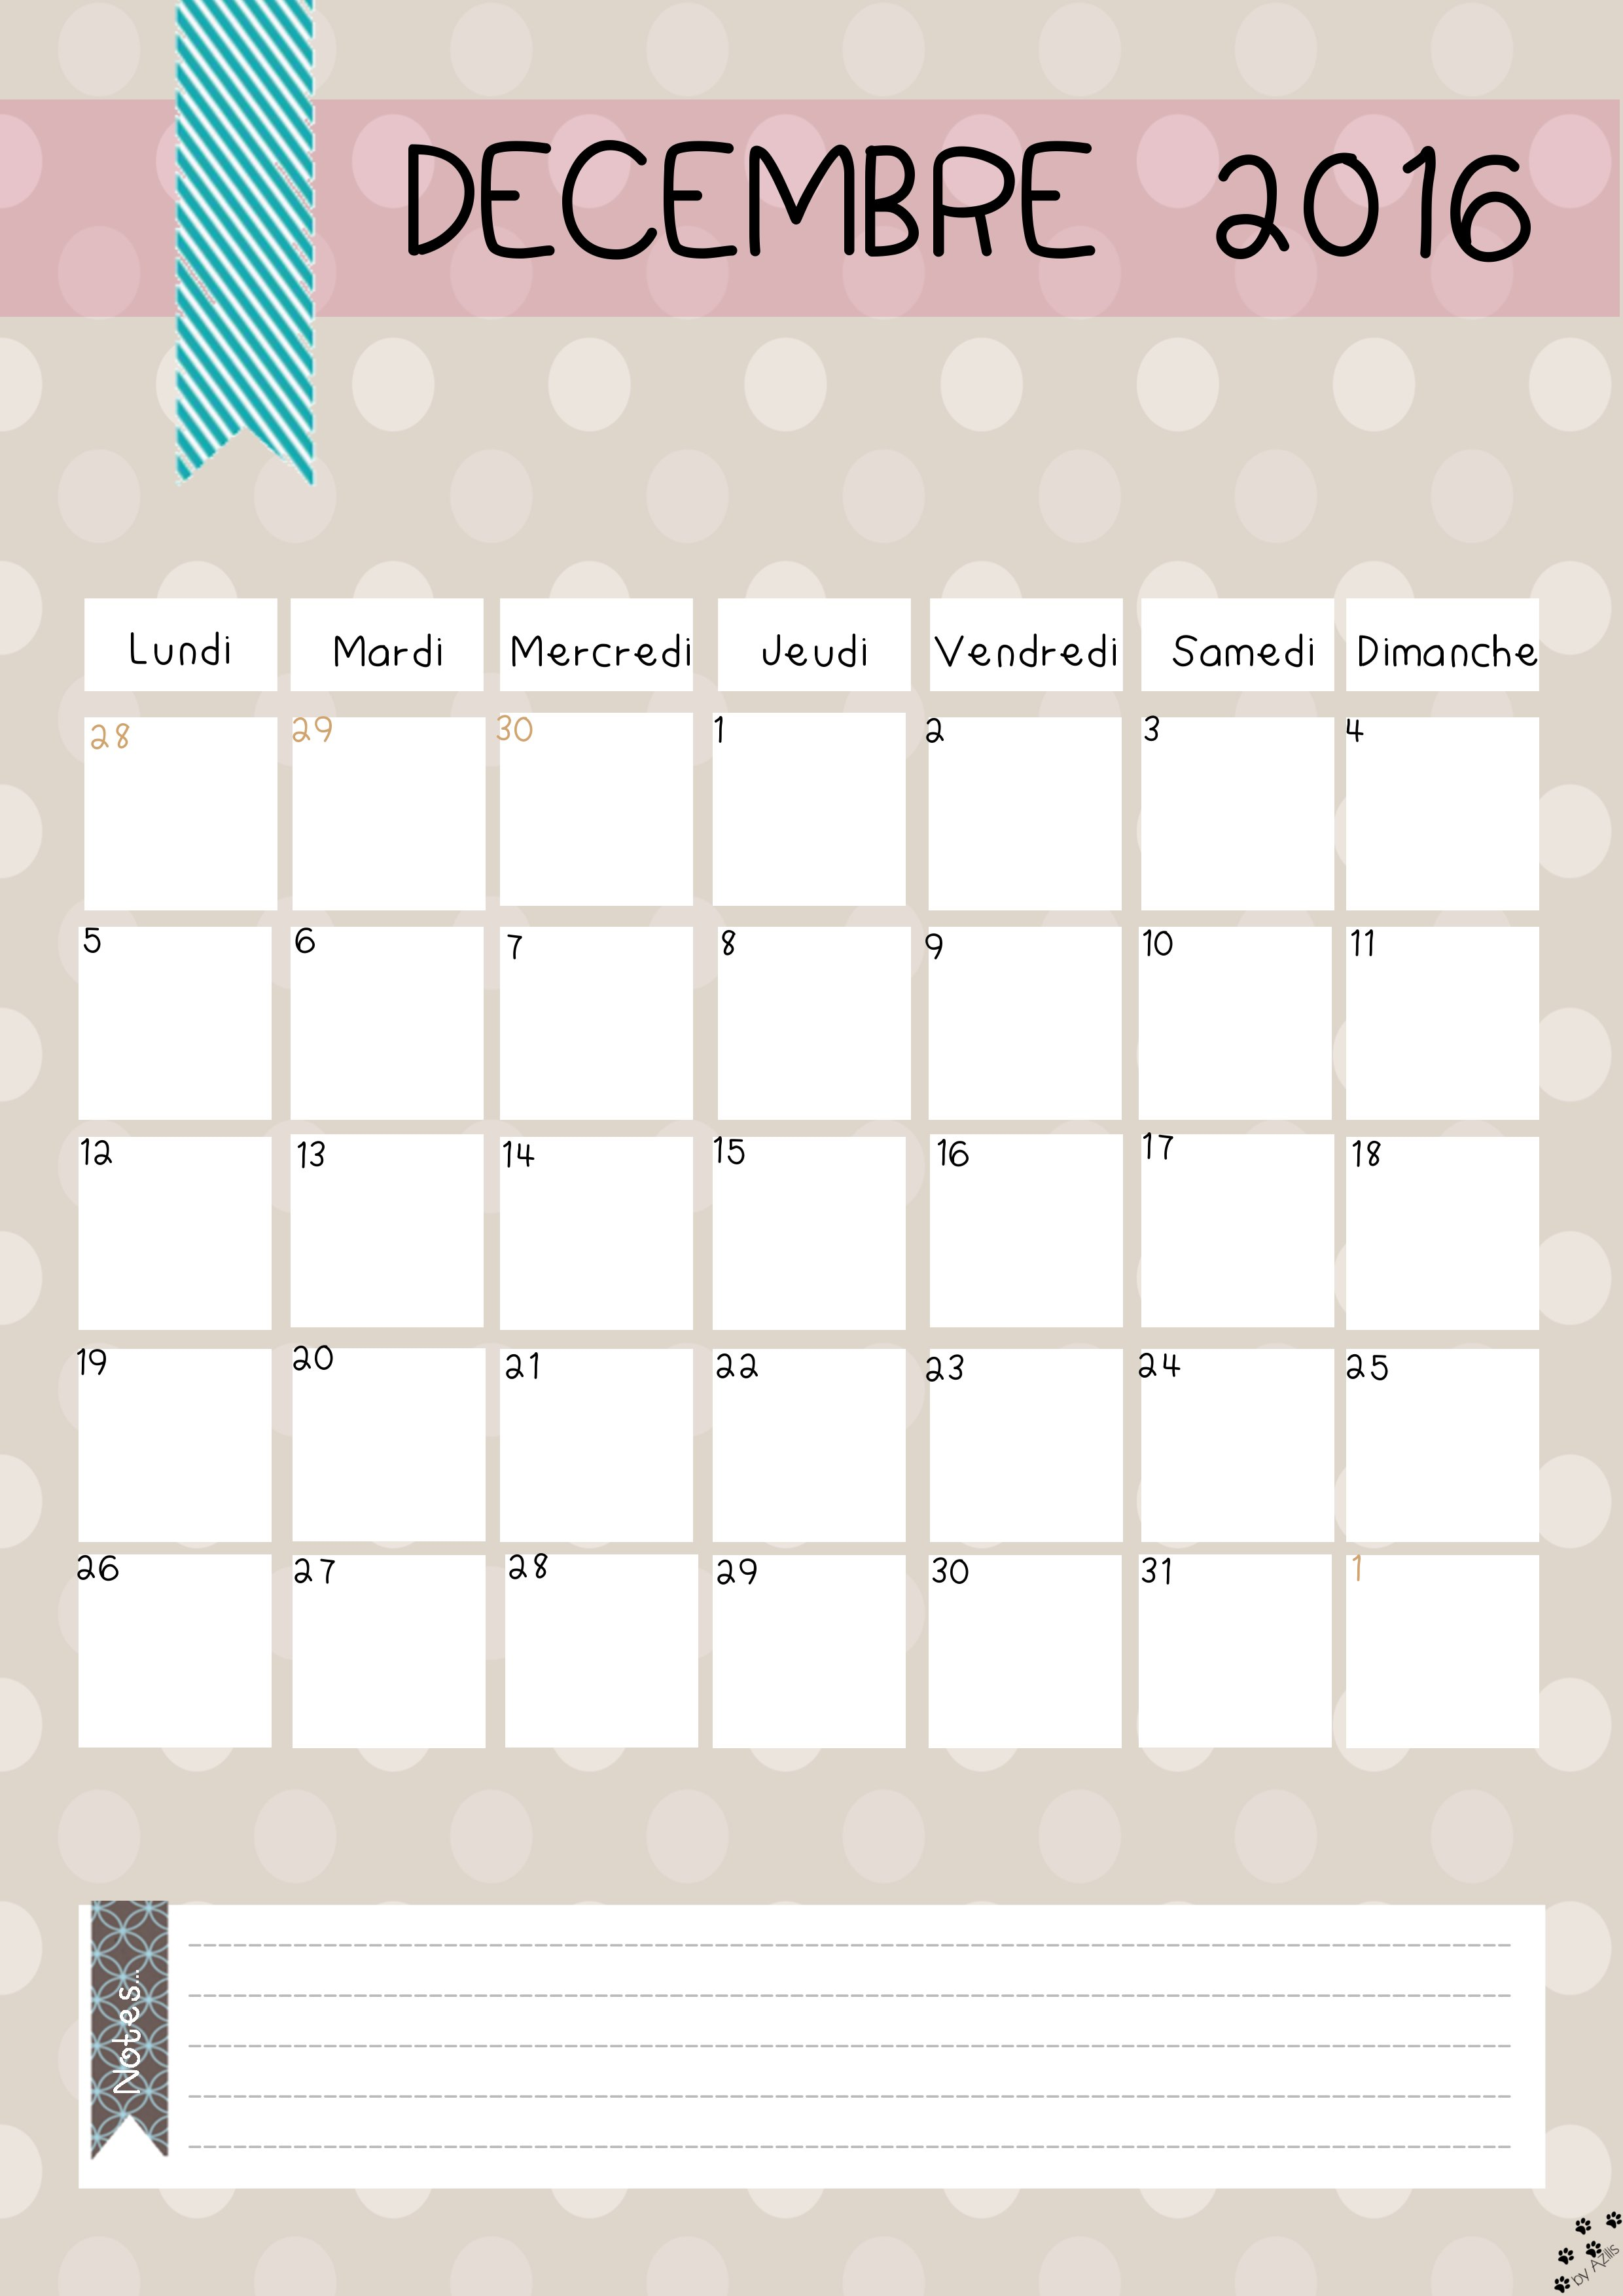 Diy calendrier 2016 gratuit imprimer - Calendrier du jardinier 2017 ...